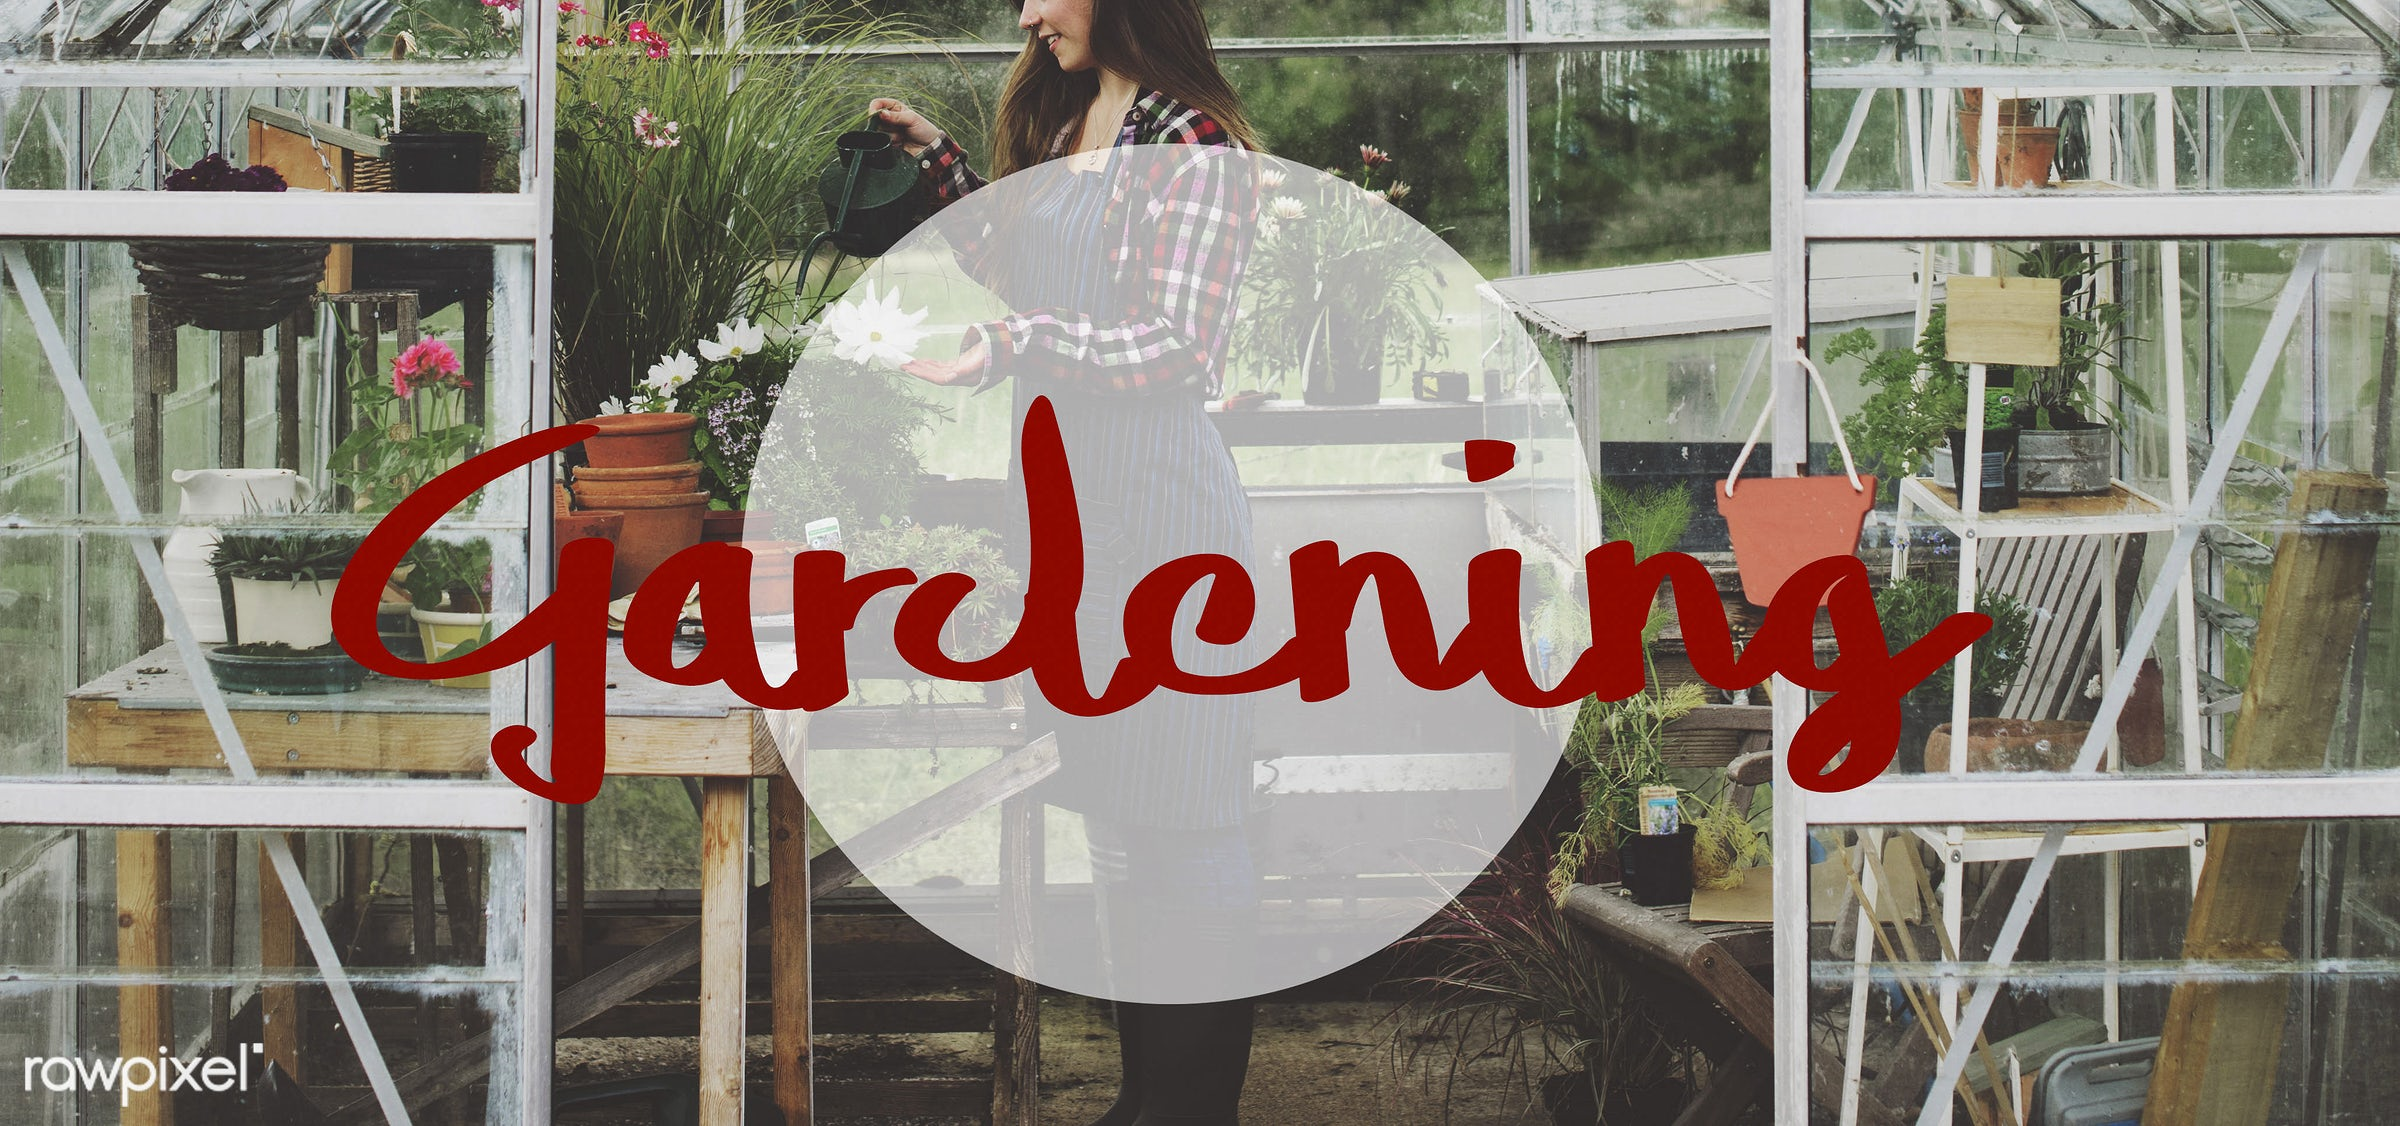 apron, caucasian, dark blonde, female, flowerpot, flowers, garden, gardener, gardening, glasshouse, grass, green, hands,...